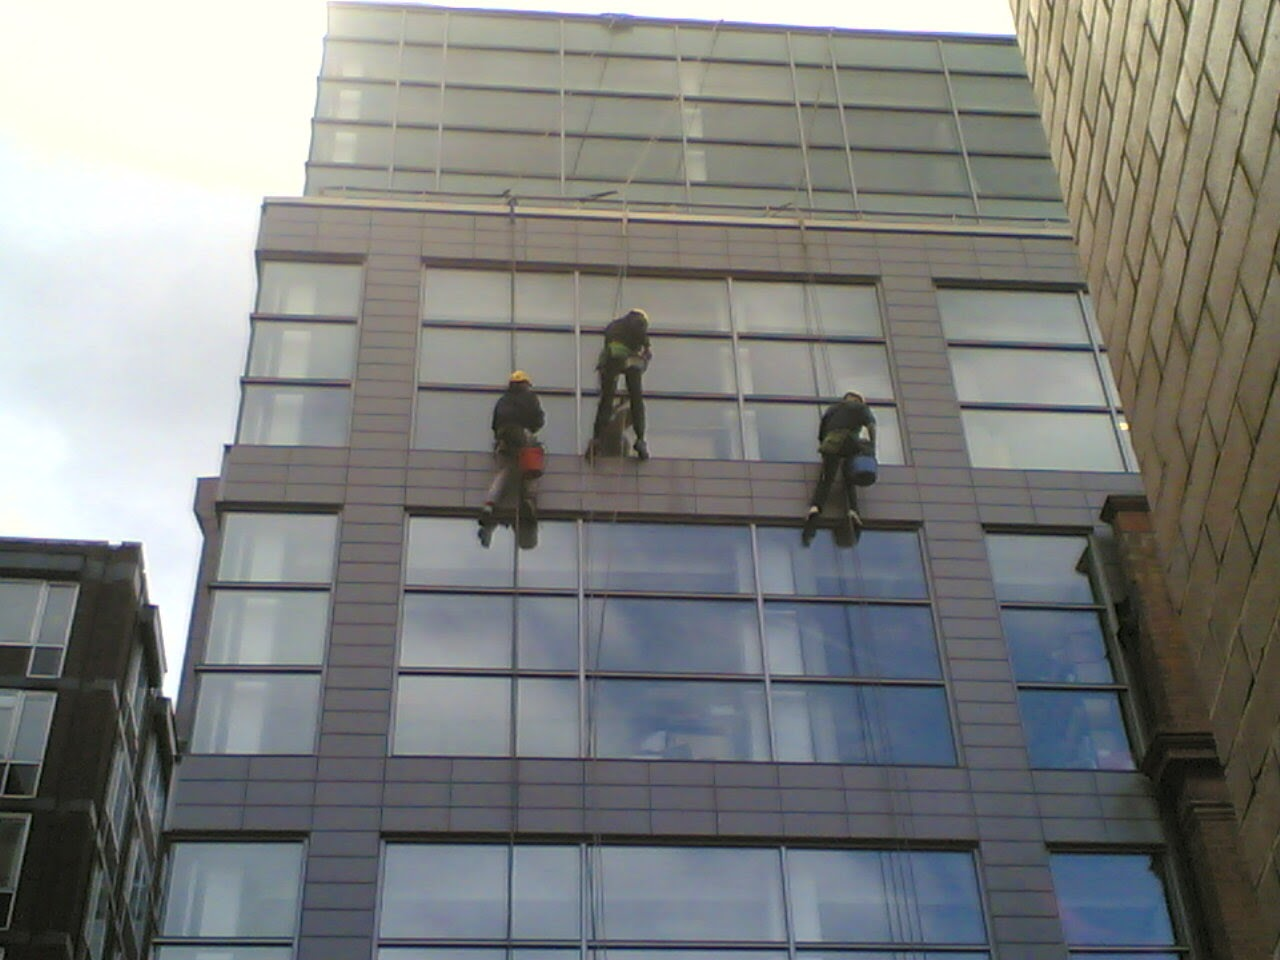 Office Building Window Clean by Insightuk